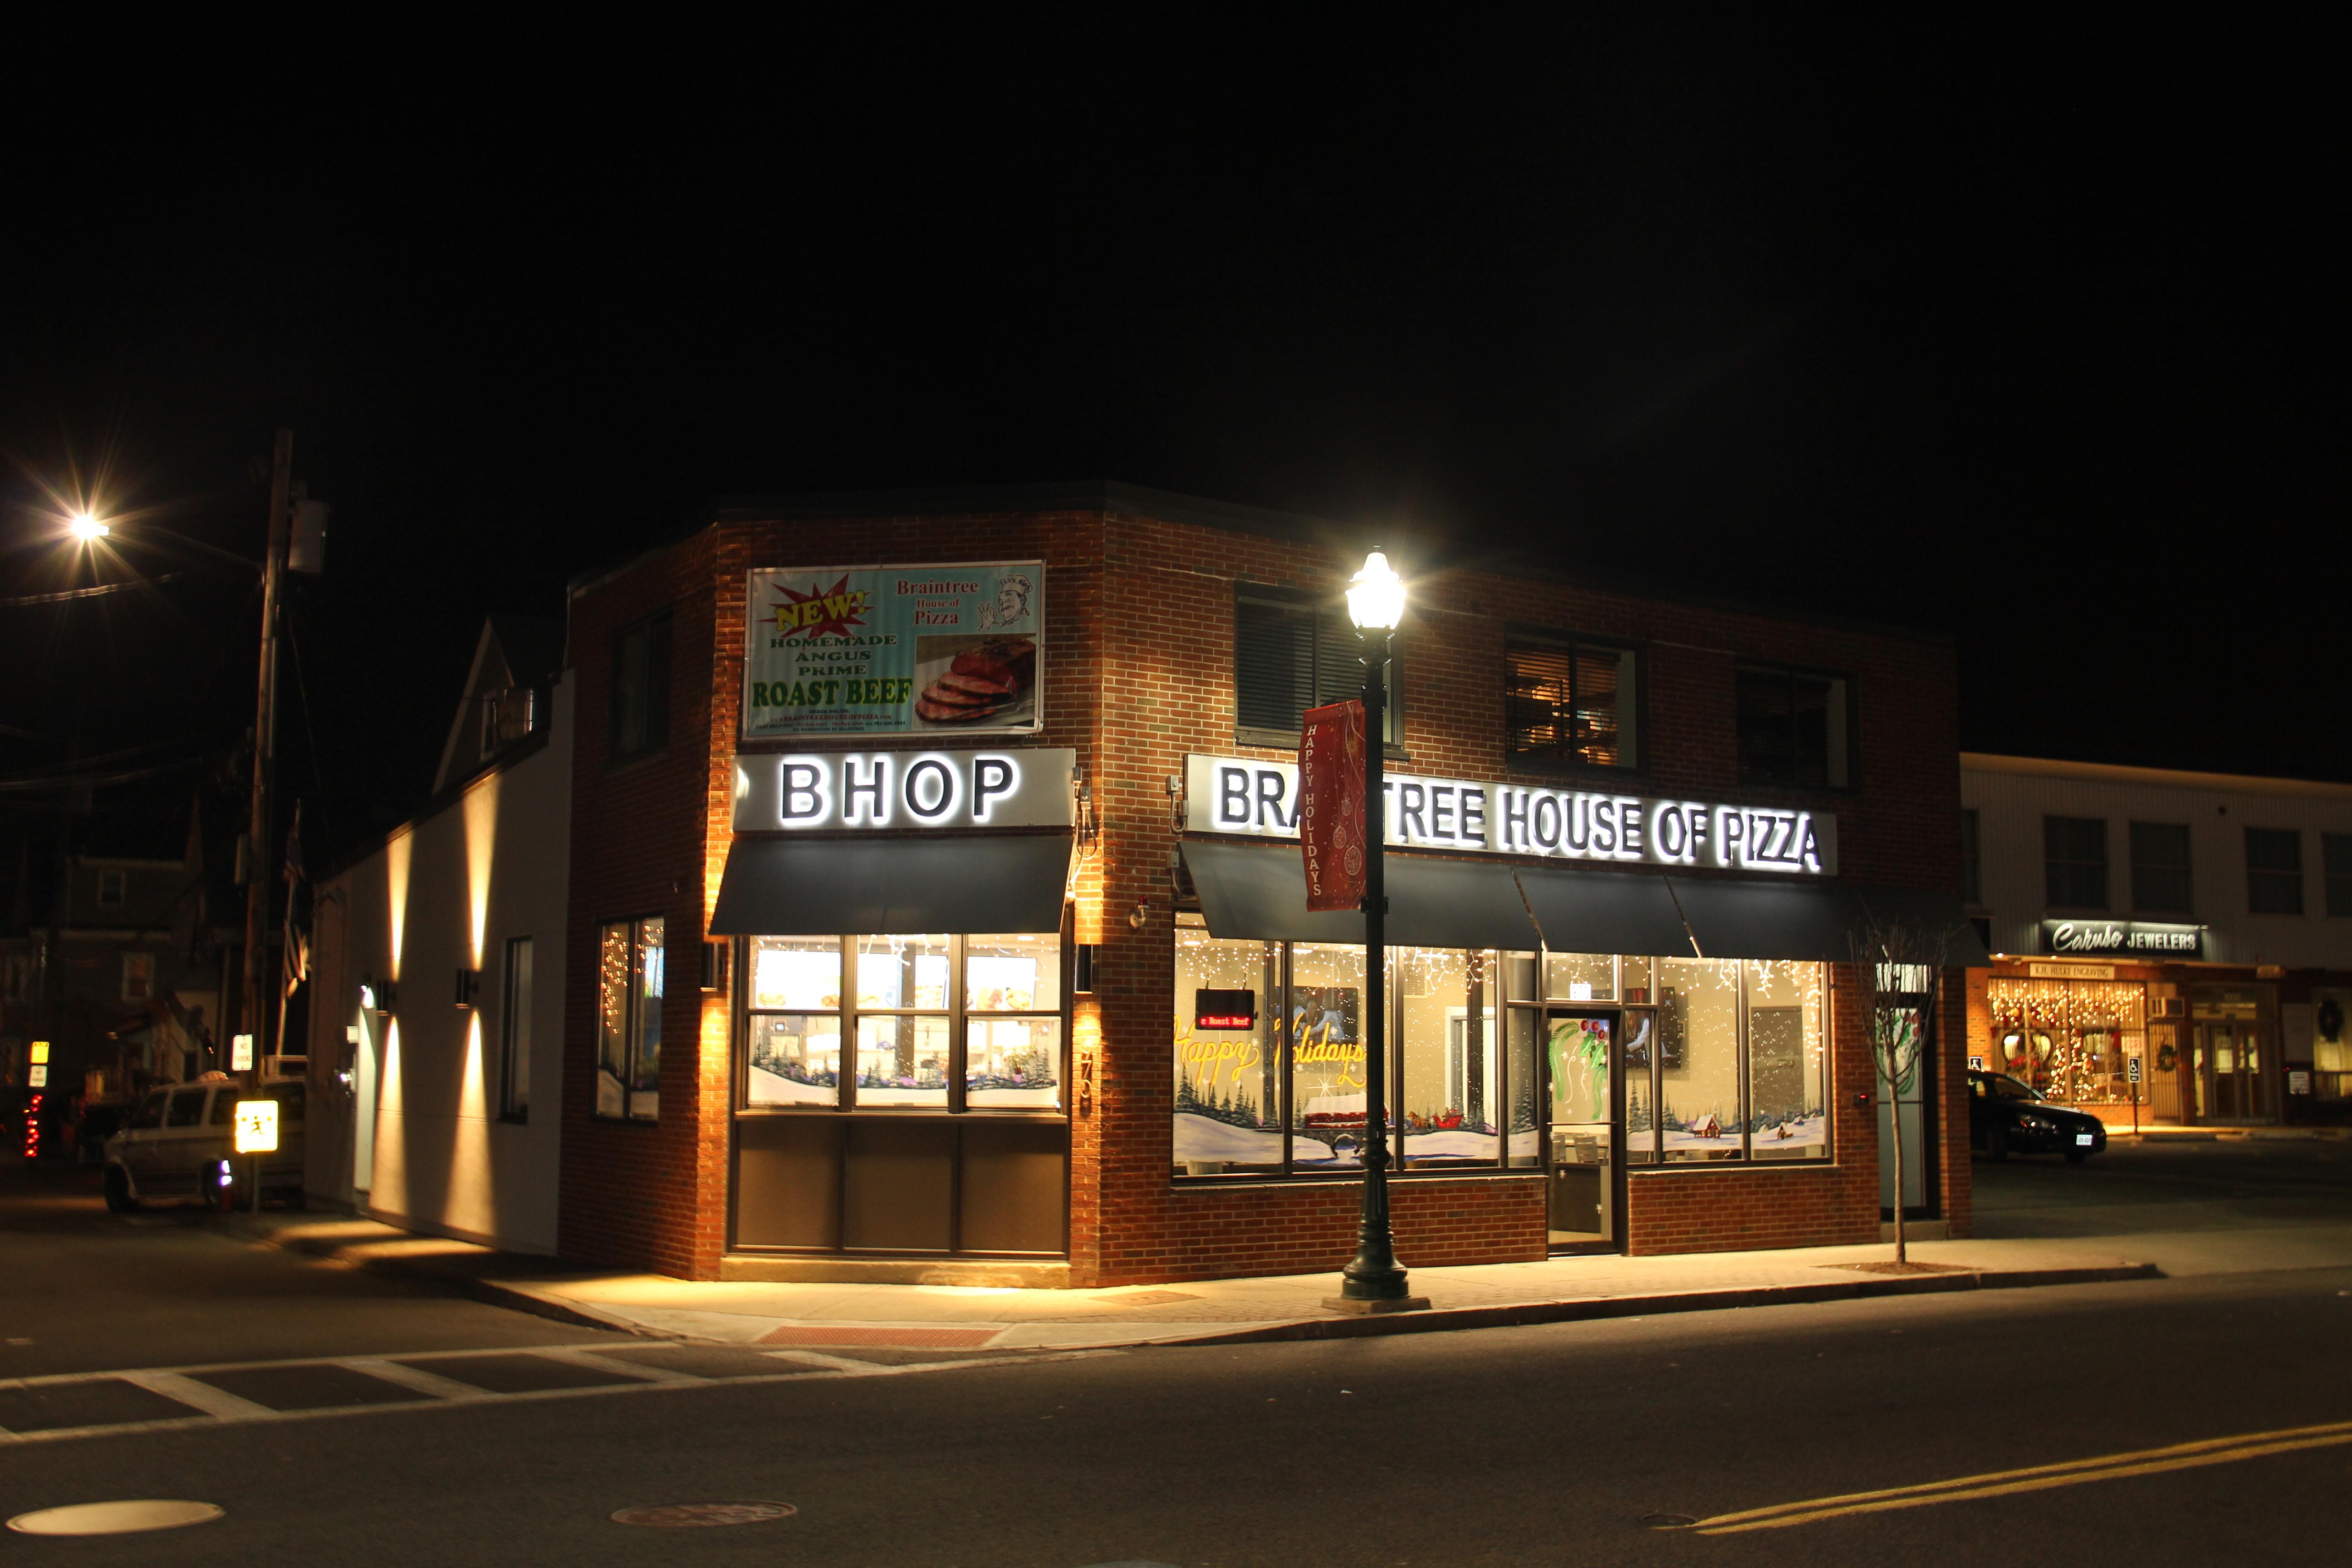 Braintree plaza coupons